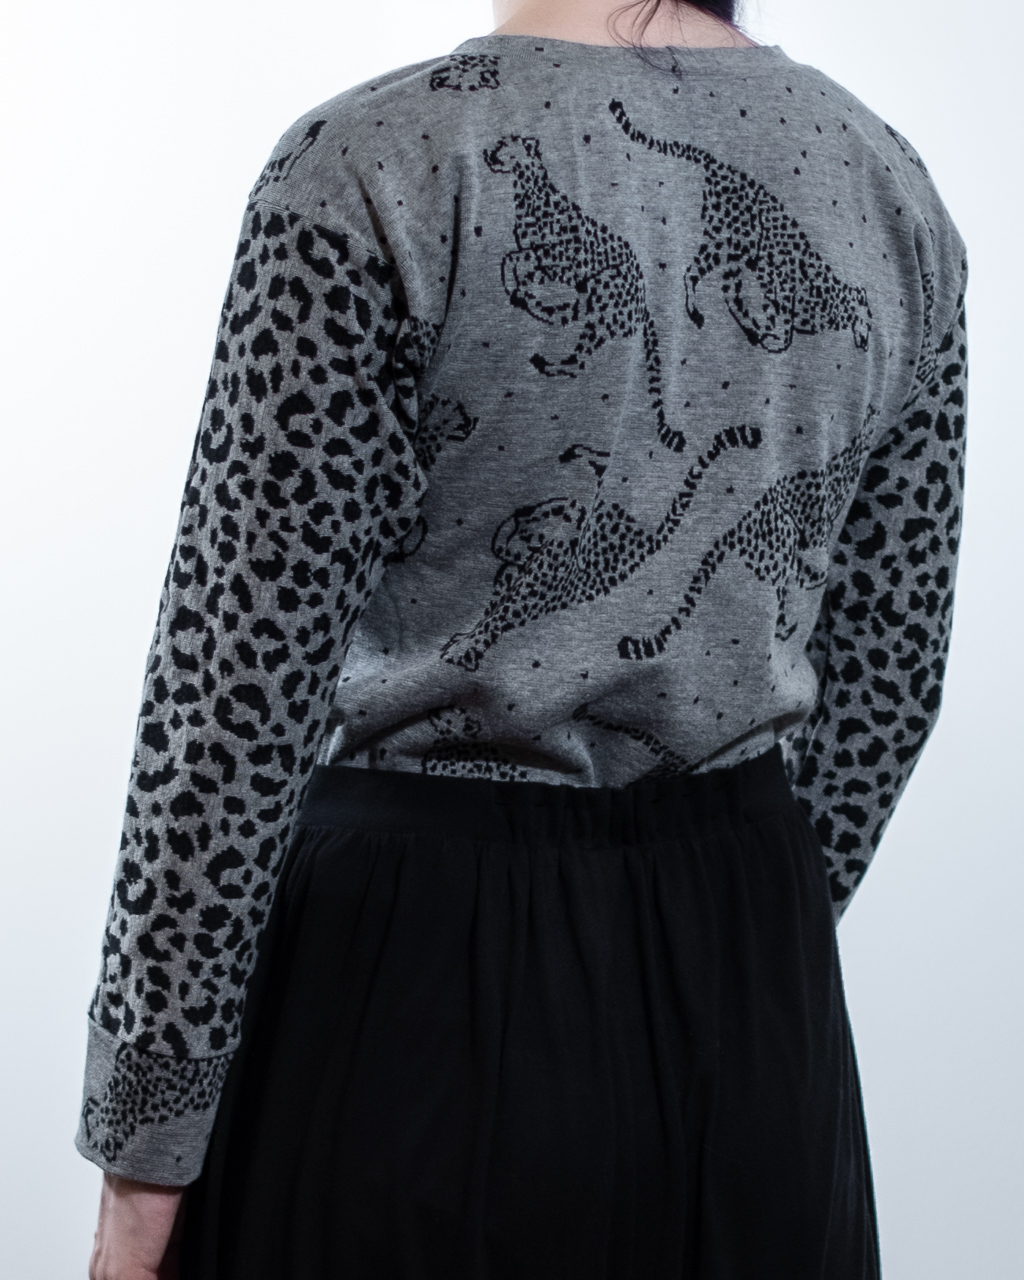 cheetah fabric sweatshirt selfdrafted modified sewing pattern Minn's Things back without yolk